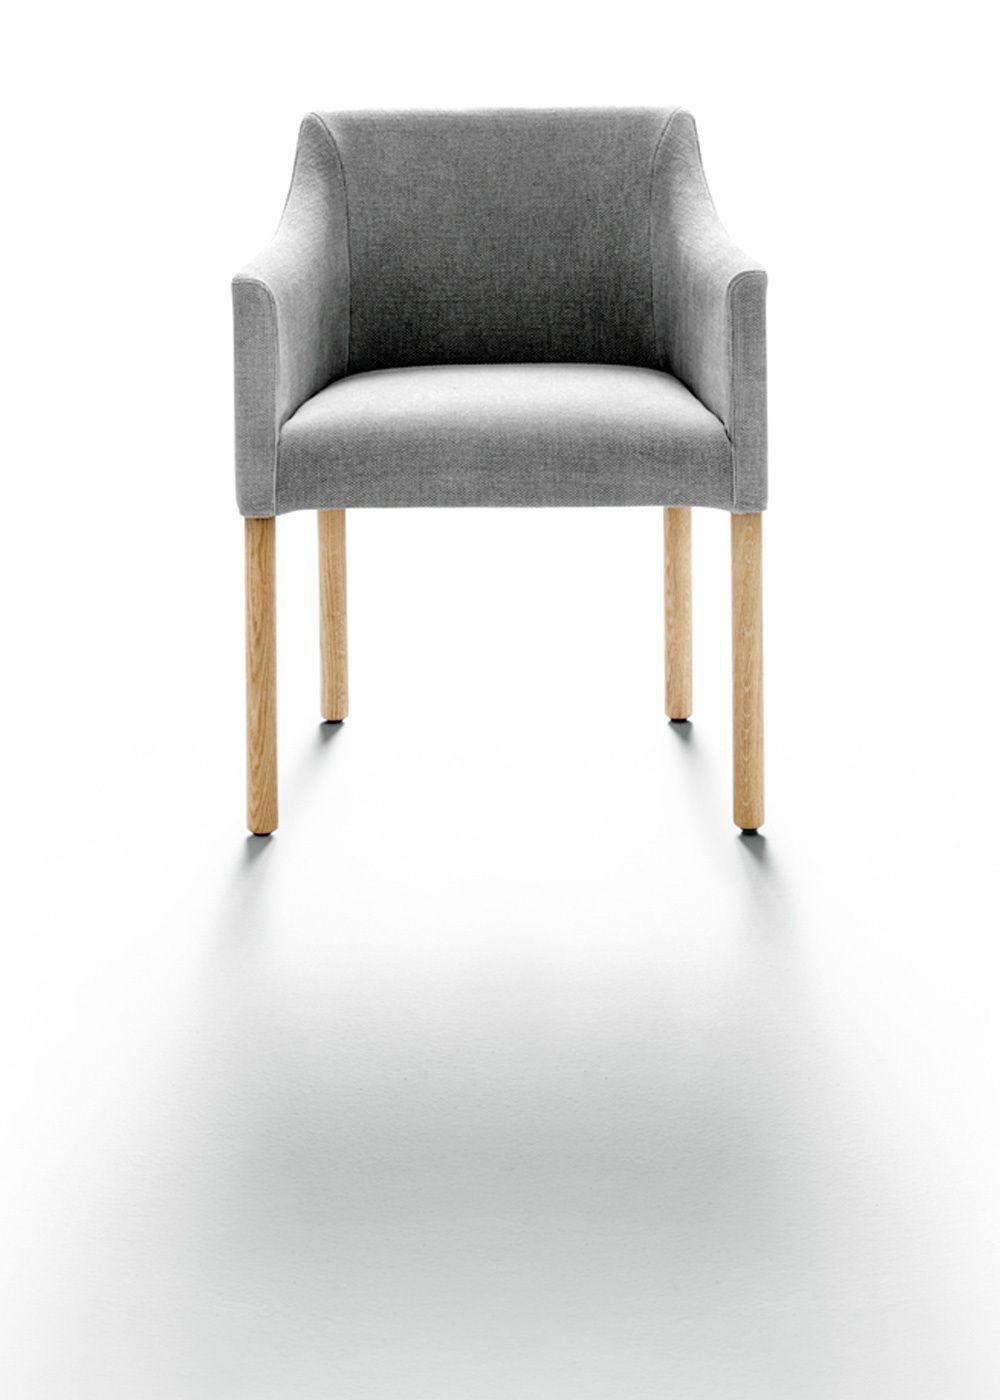 De Padova srl | Prodotti | Sedie | Pollack | DE PADOVA | furniture ...